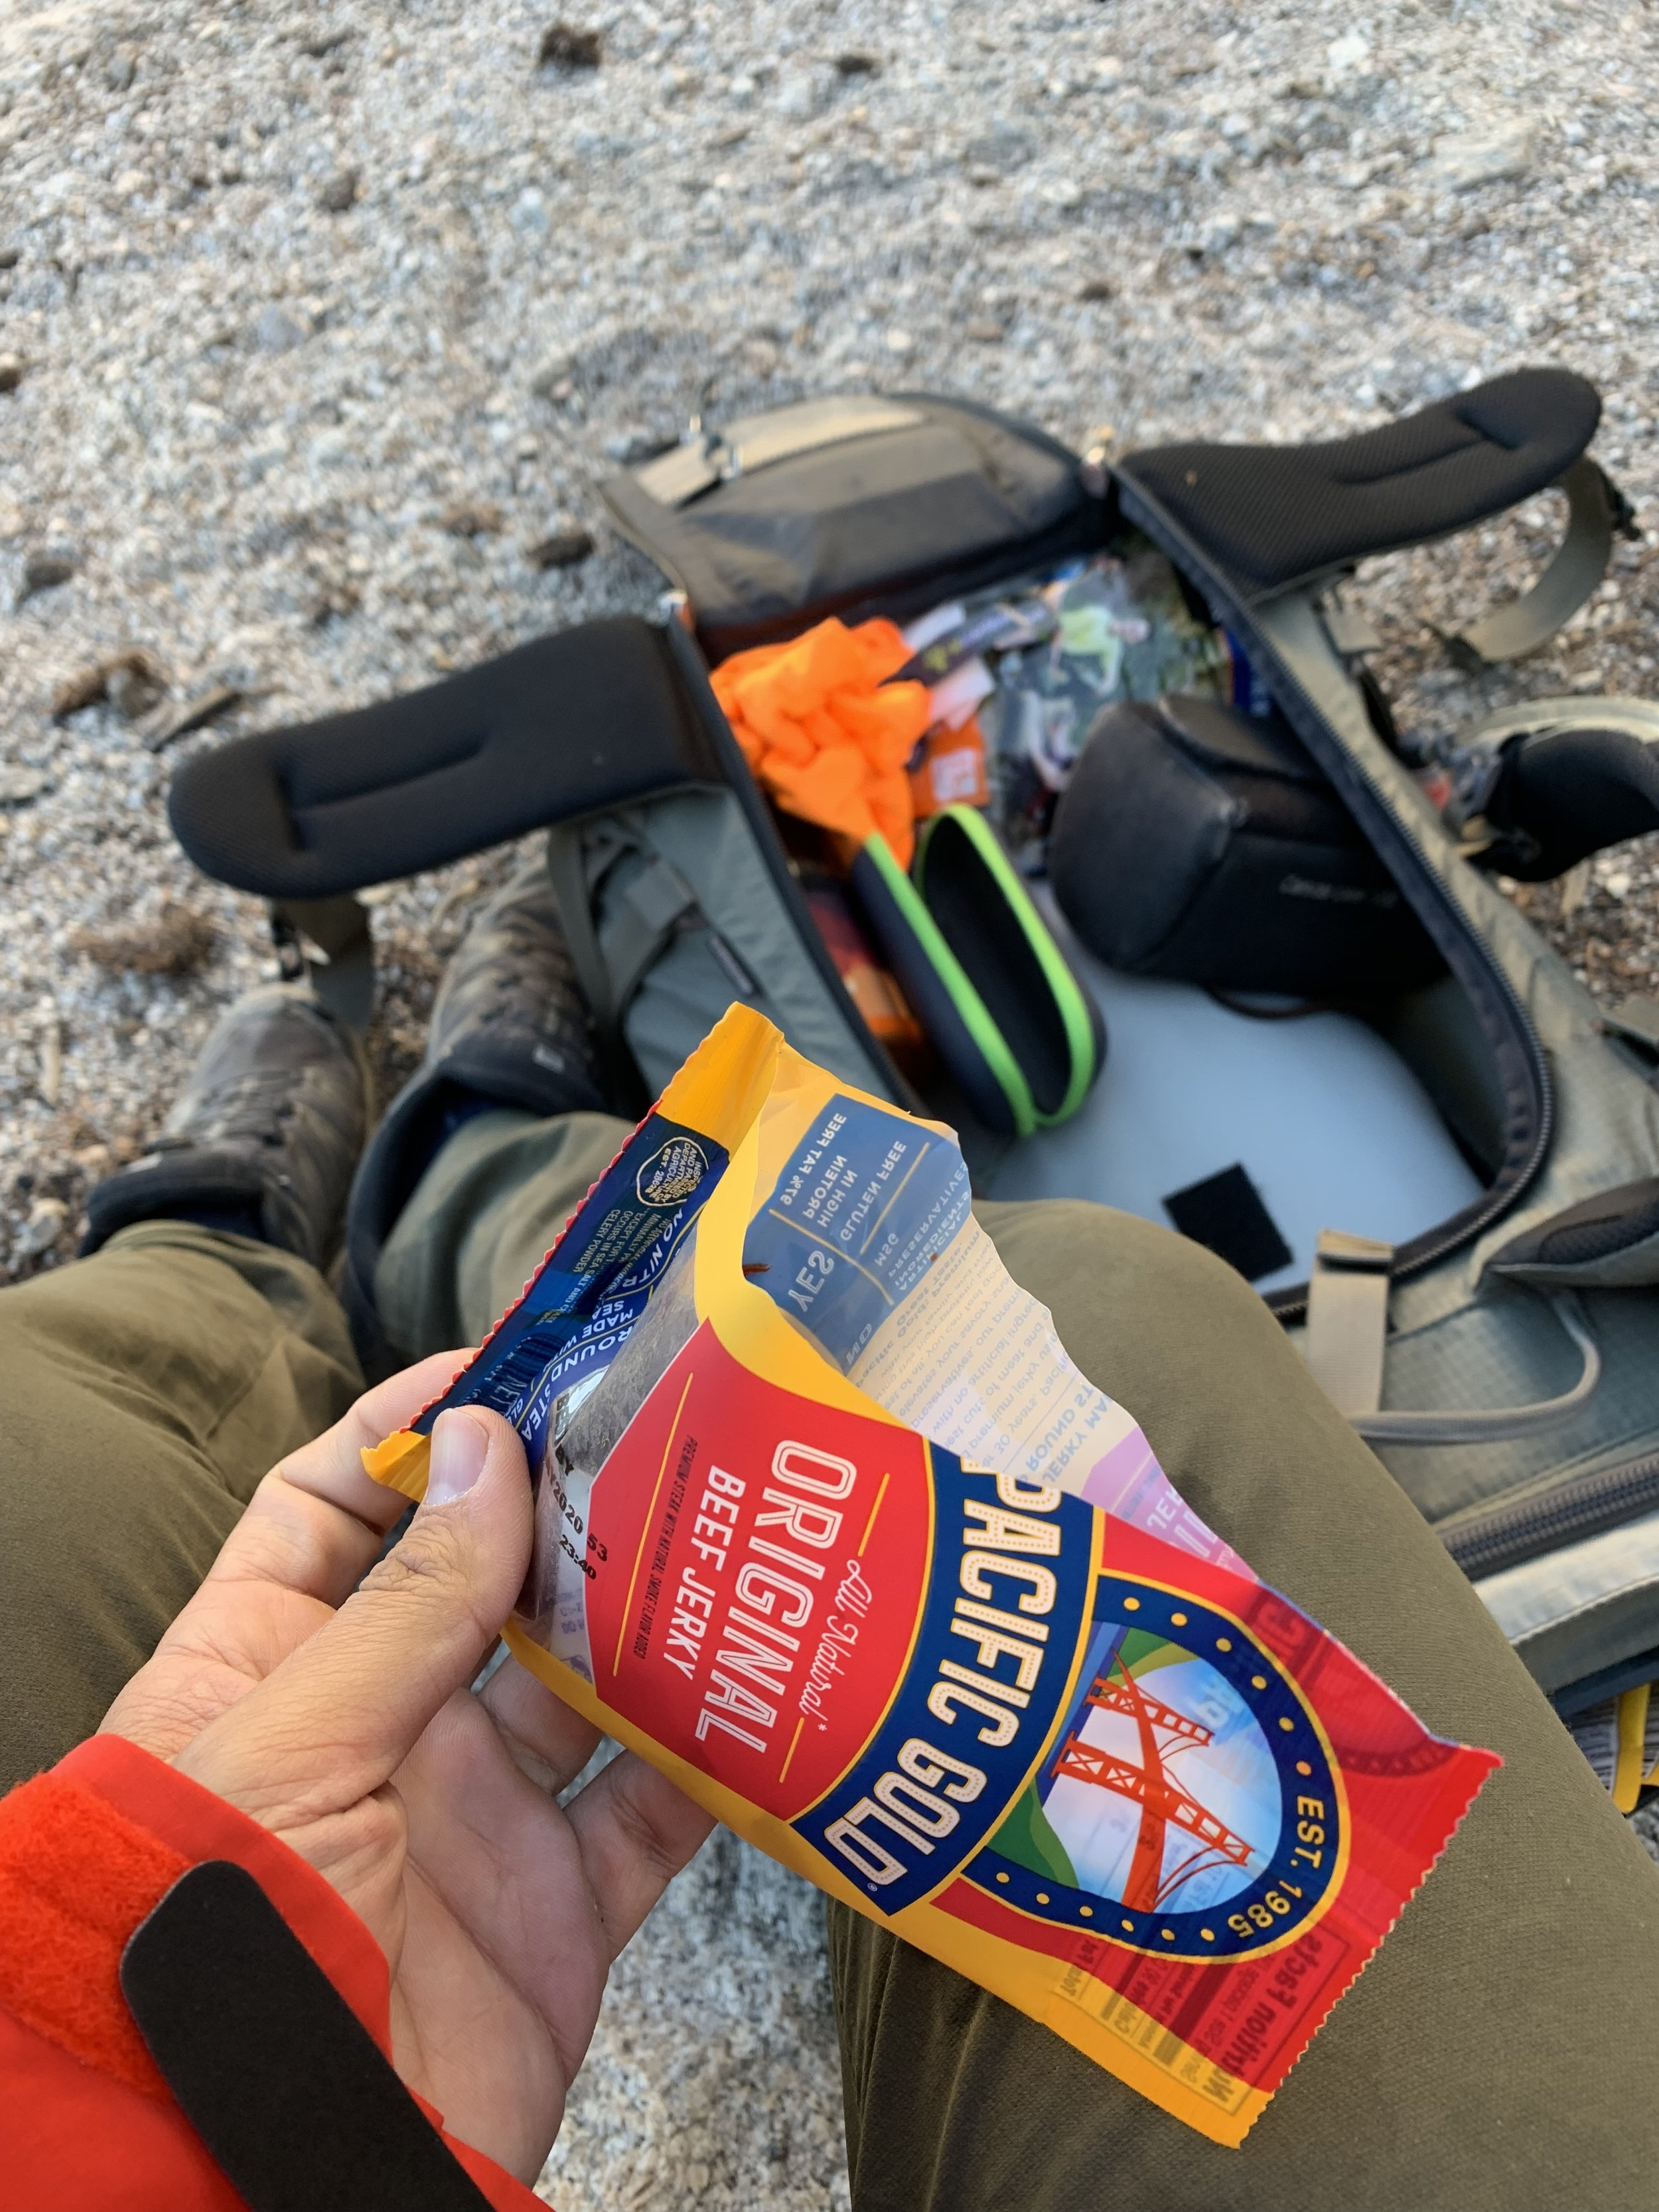 Jerky is my favorite snacks on trails.